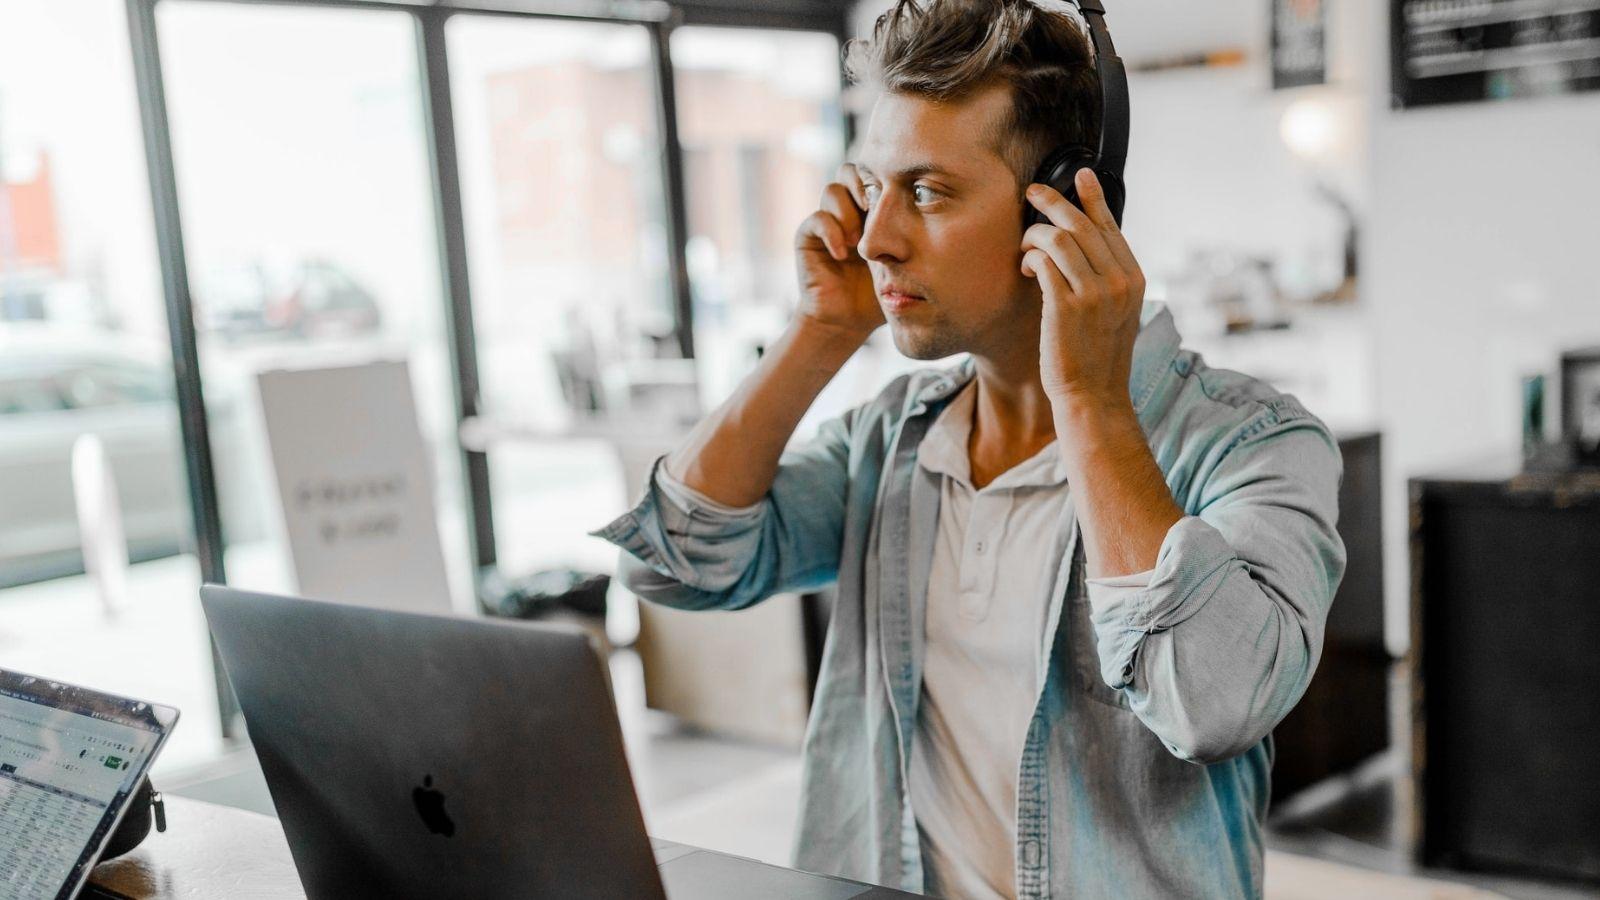 Man Using Headset On Macbook